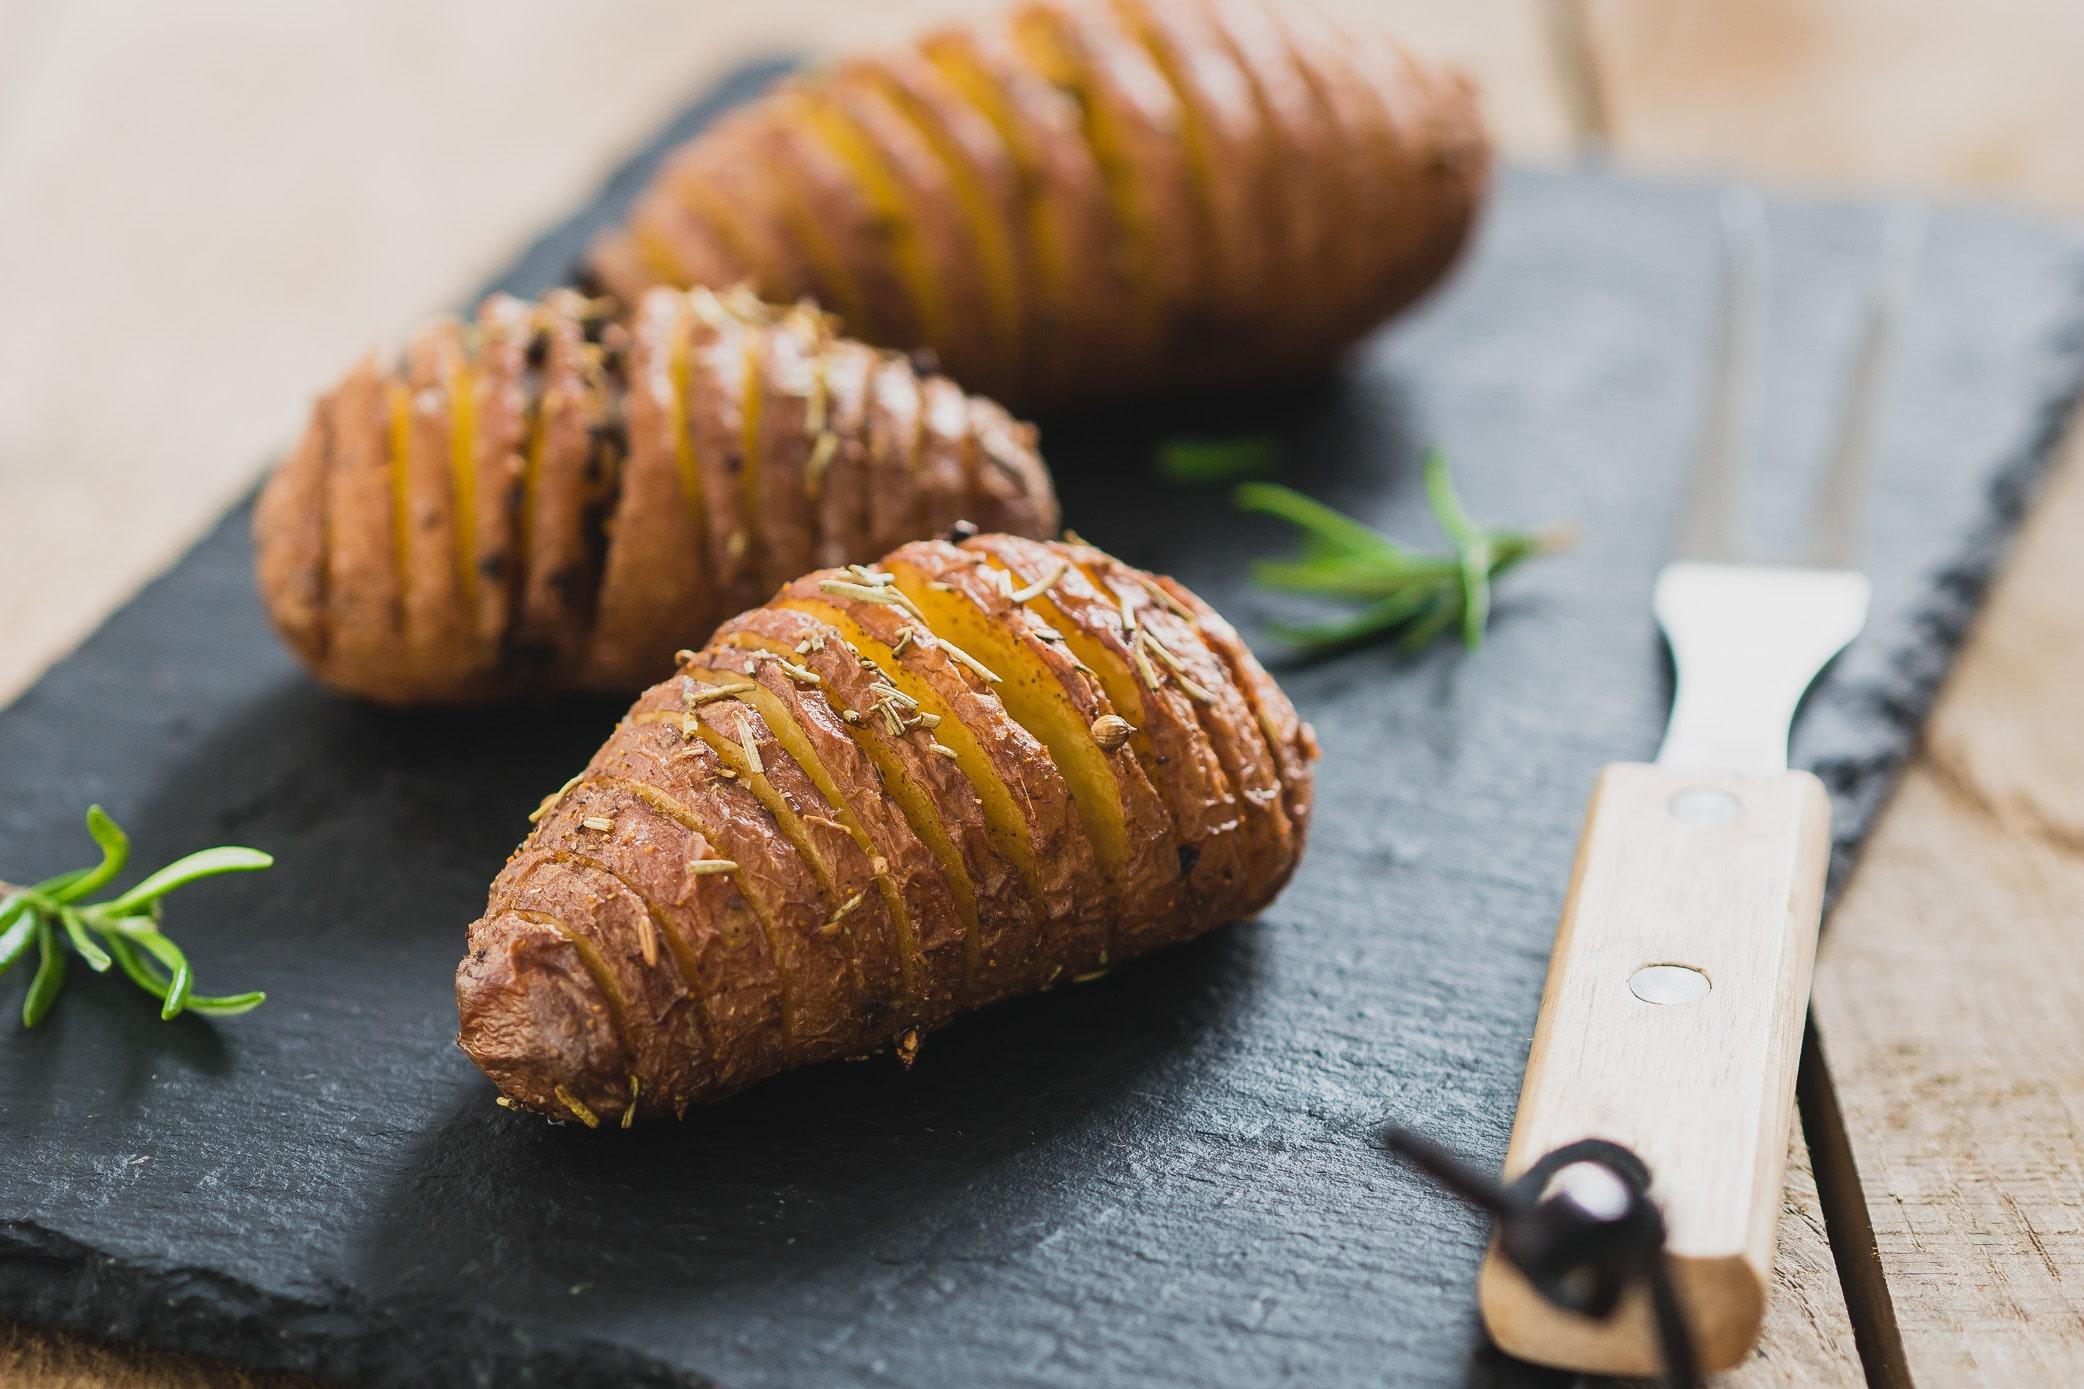 Hasselback aardappels met kruidenolie